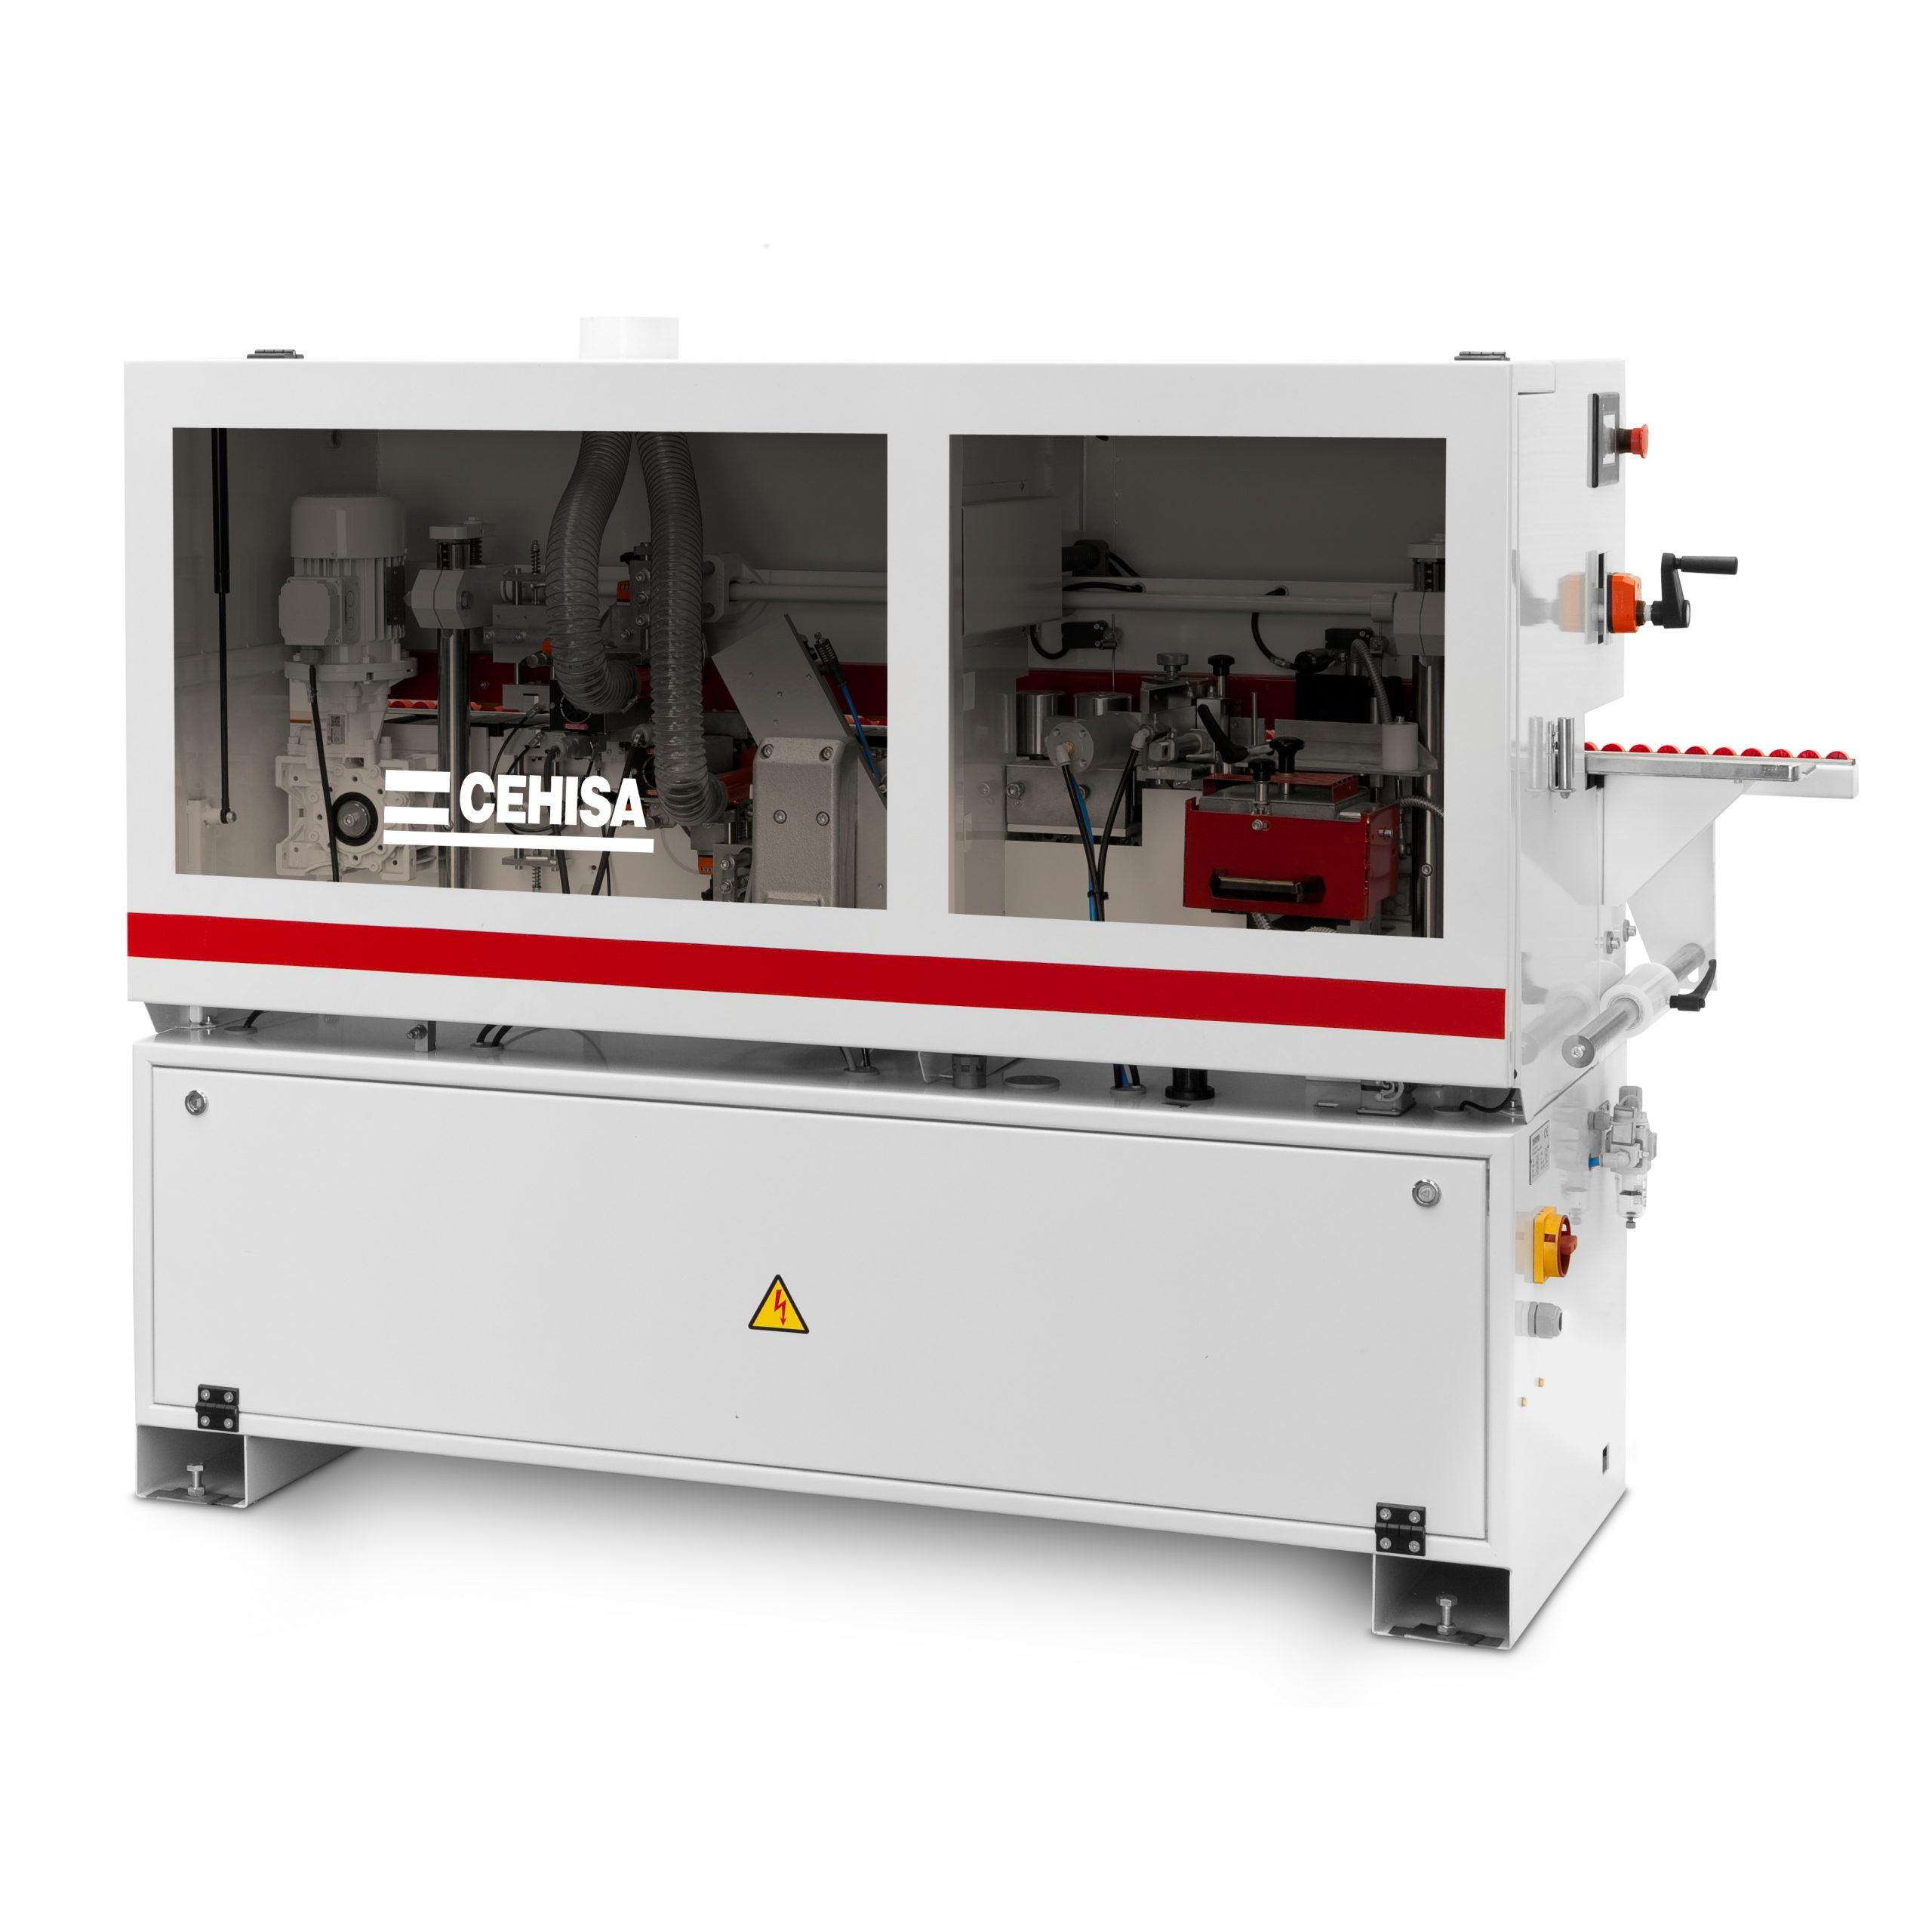 Автоматични кантиращи машини CEHISA – серия Flexy